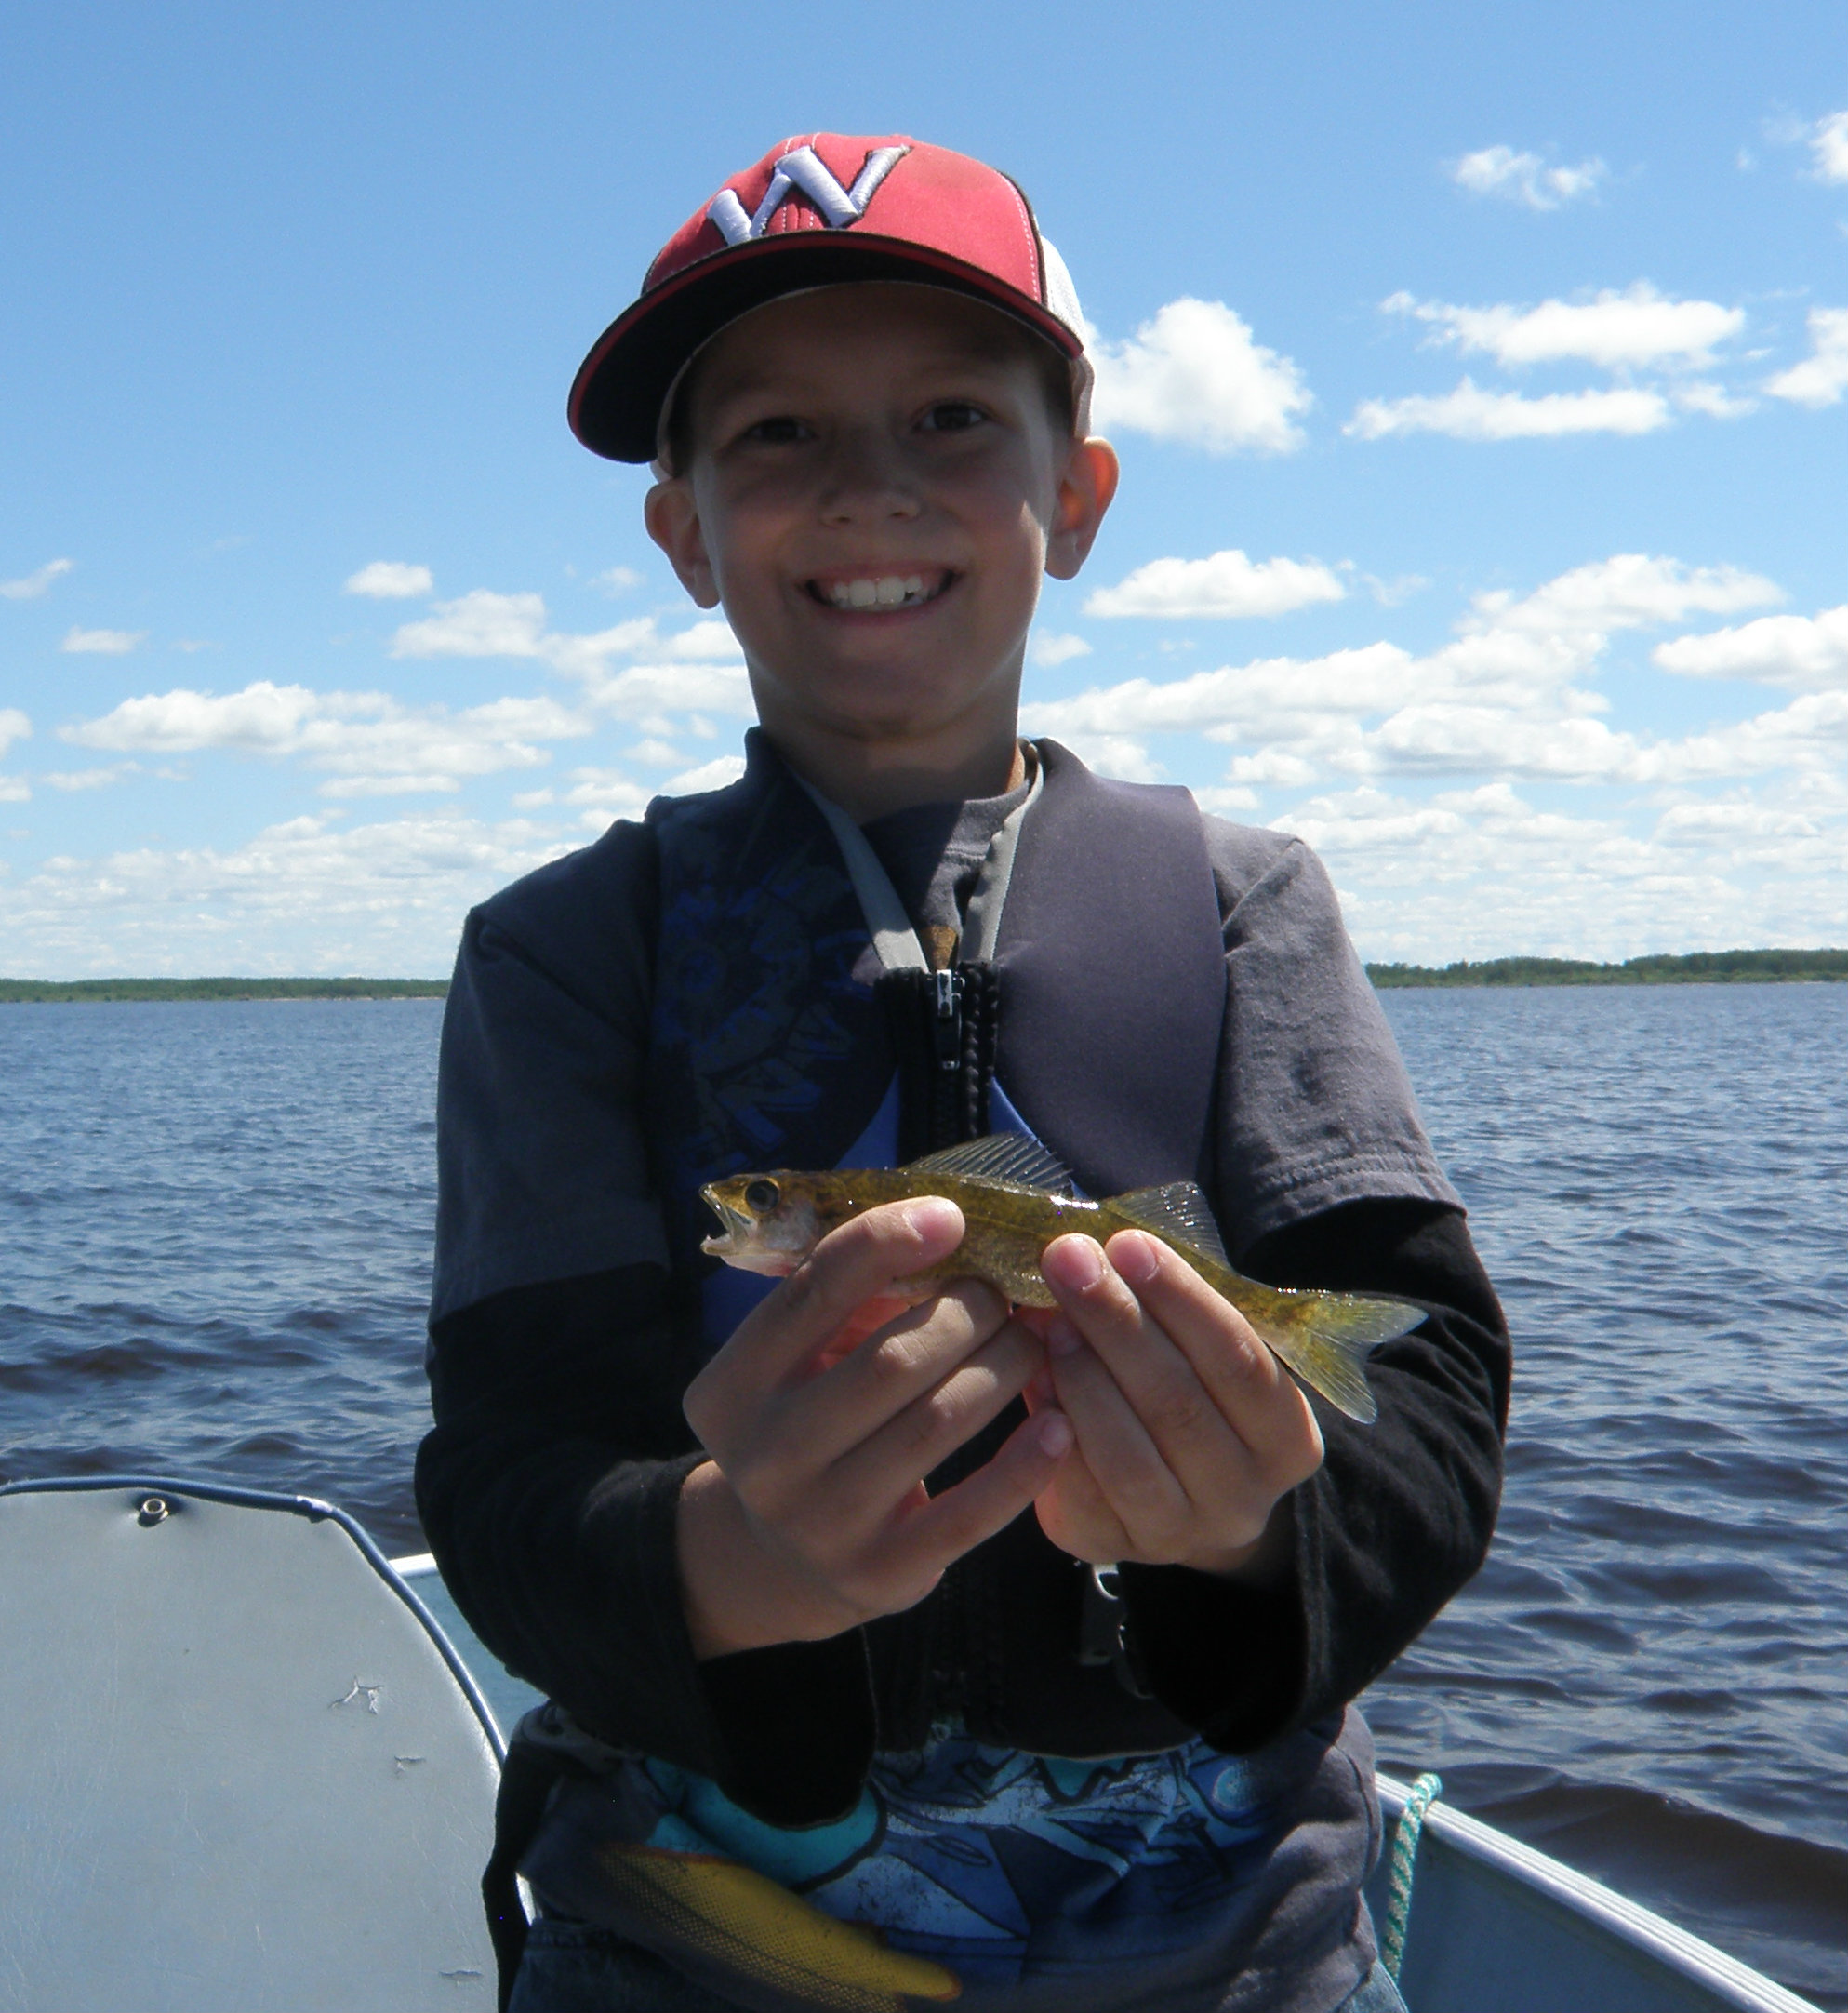 Take a kid fishing 2015 arvid 39 s fishing report for Take a kid fishing